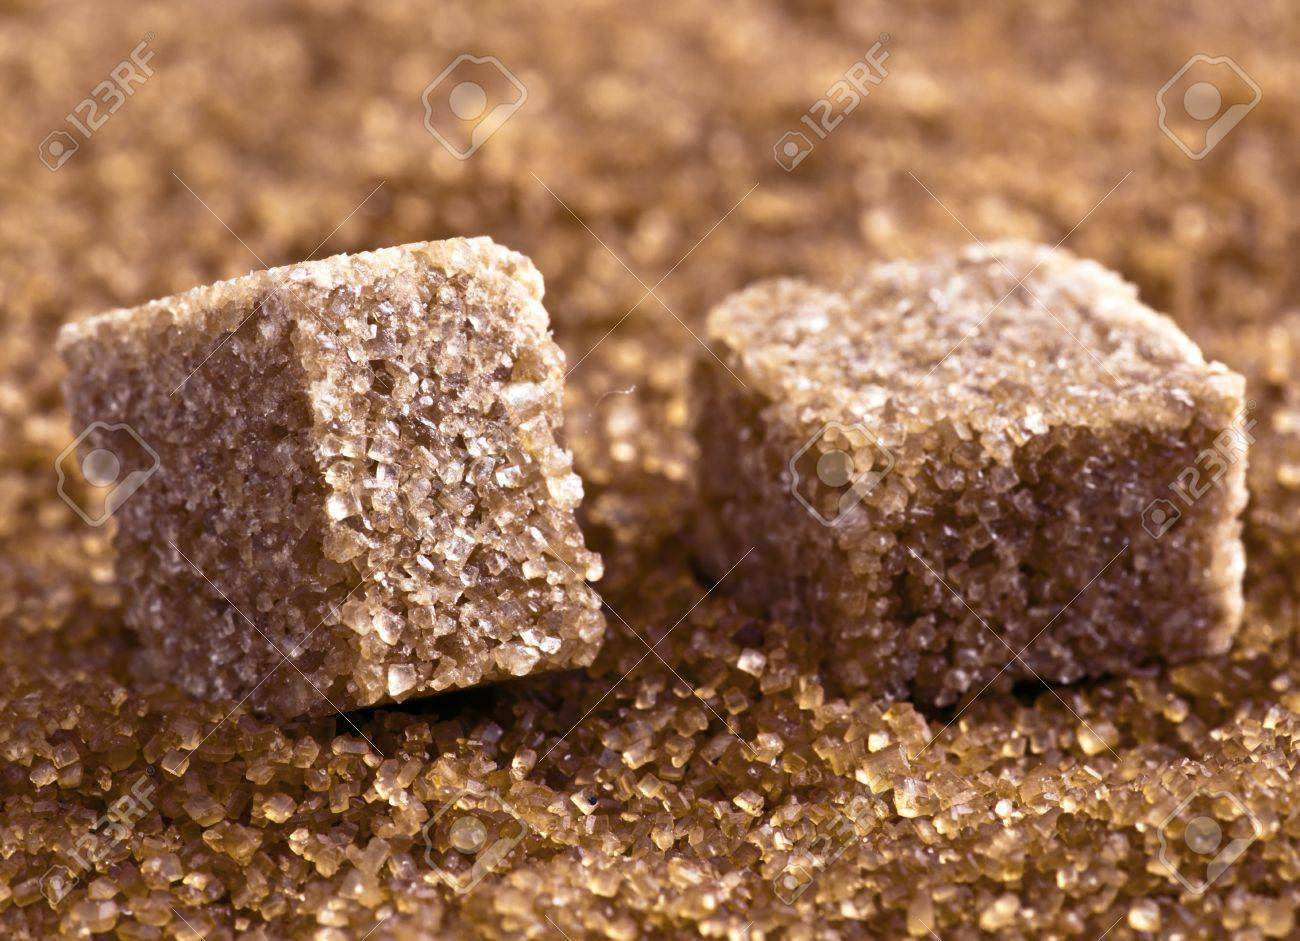 http://previews.123rf.com/images/jultud/jultud1204/jultud120400041/13089400-brown-sugar-cubes-on-powdered-sugar-Stock-Photo.jpg